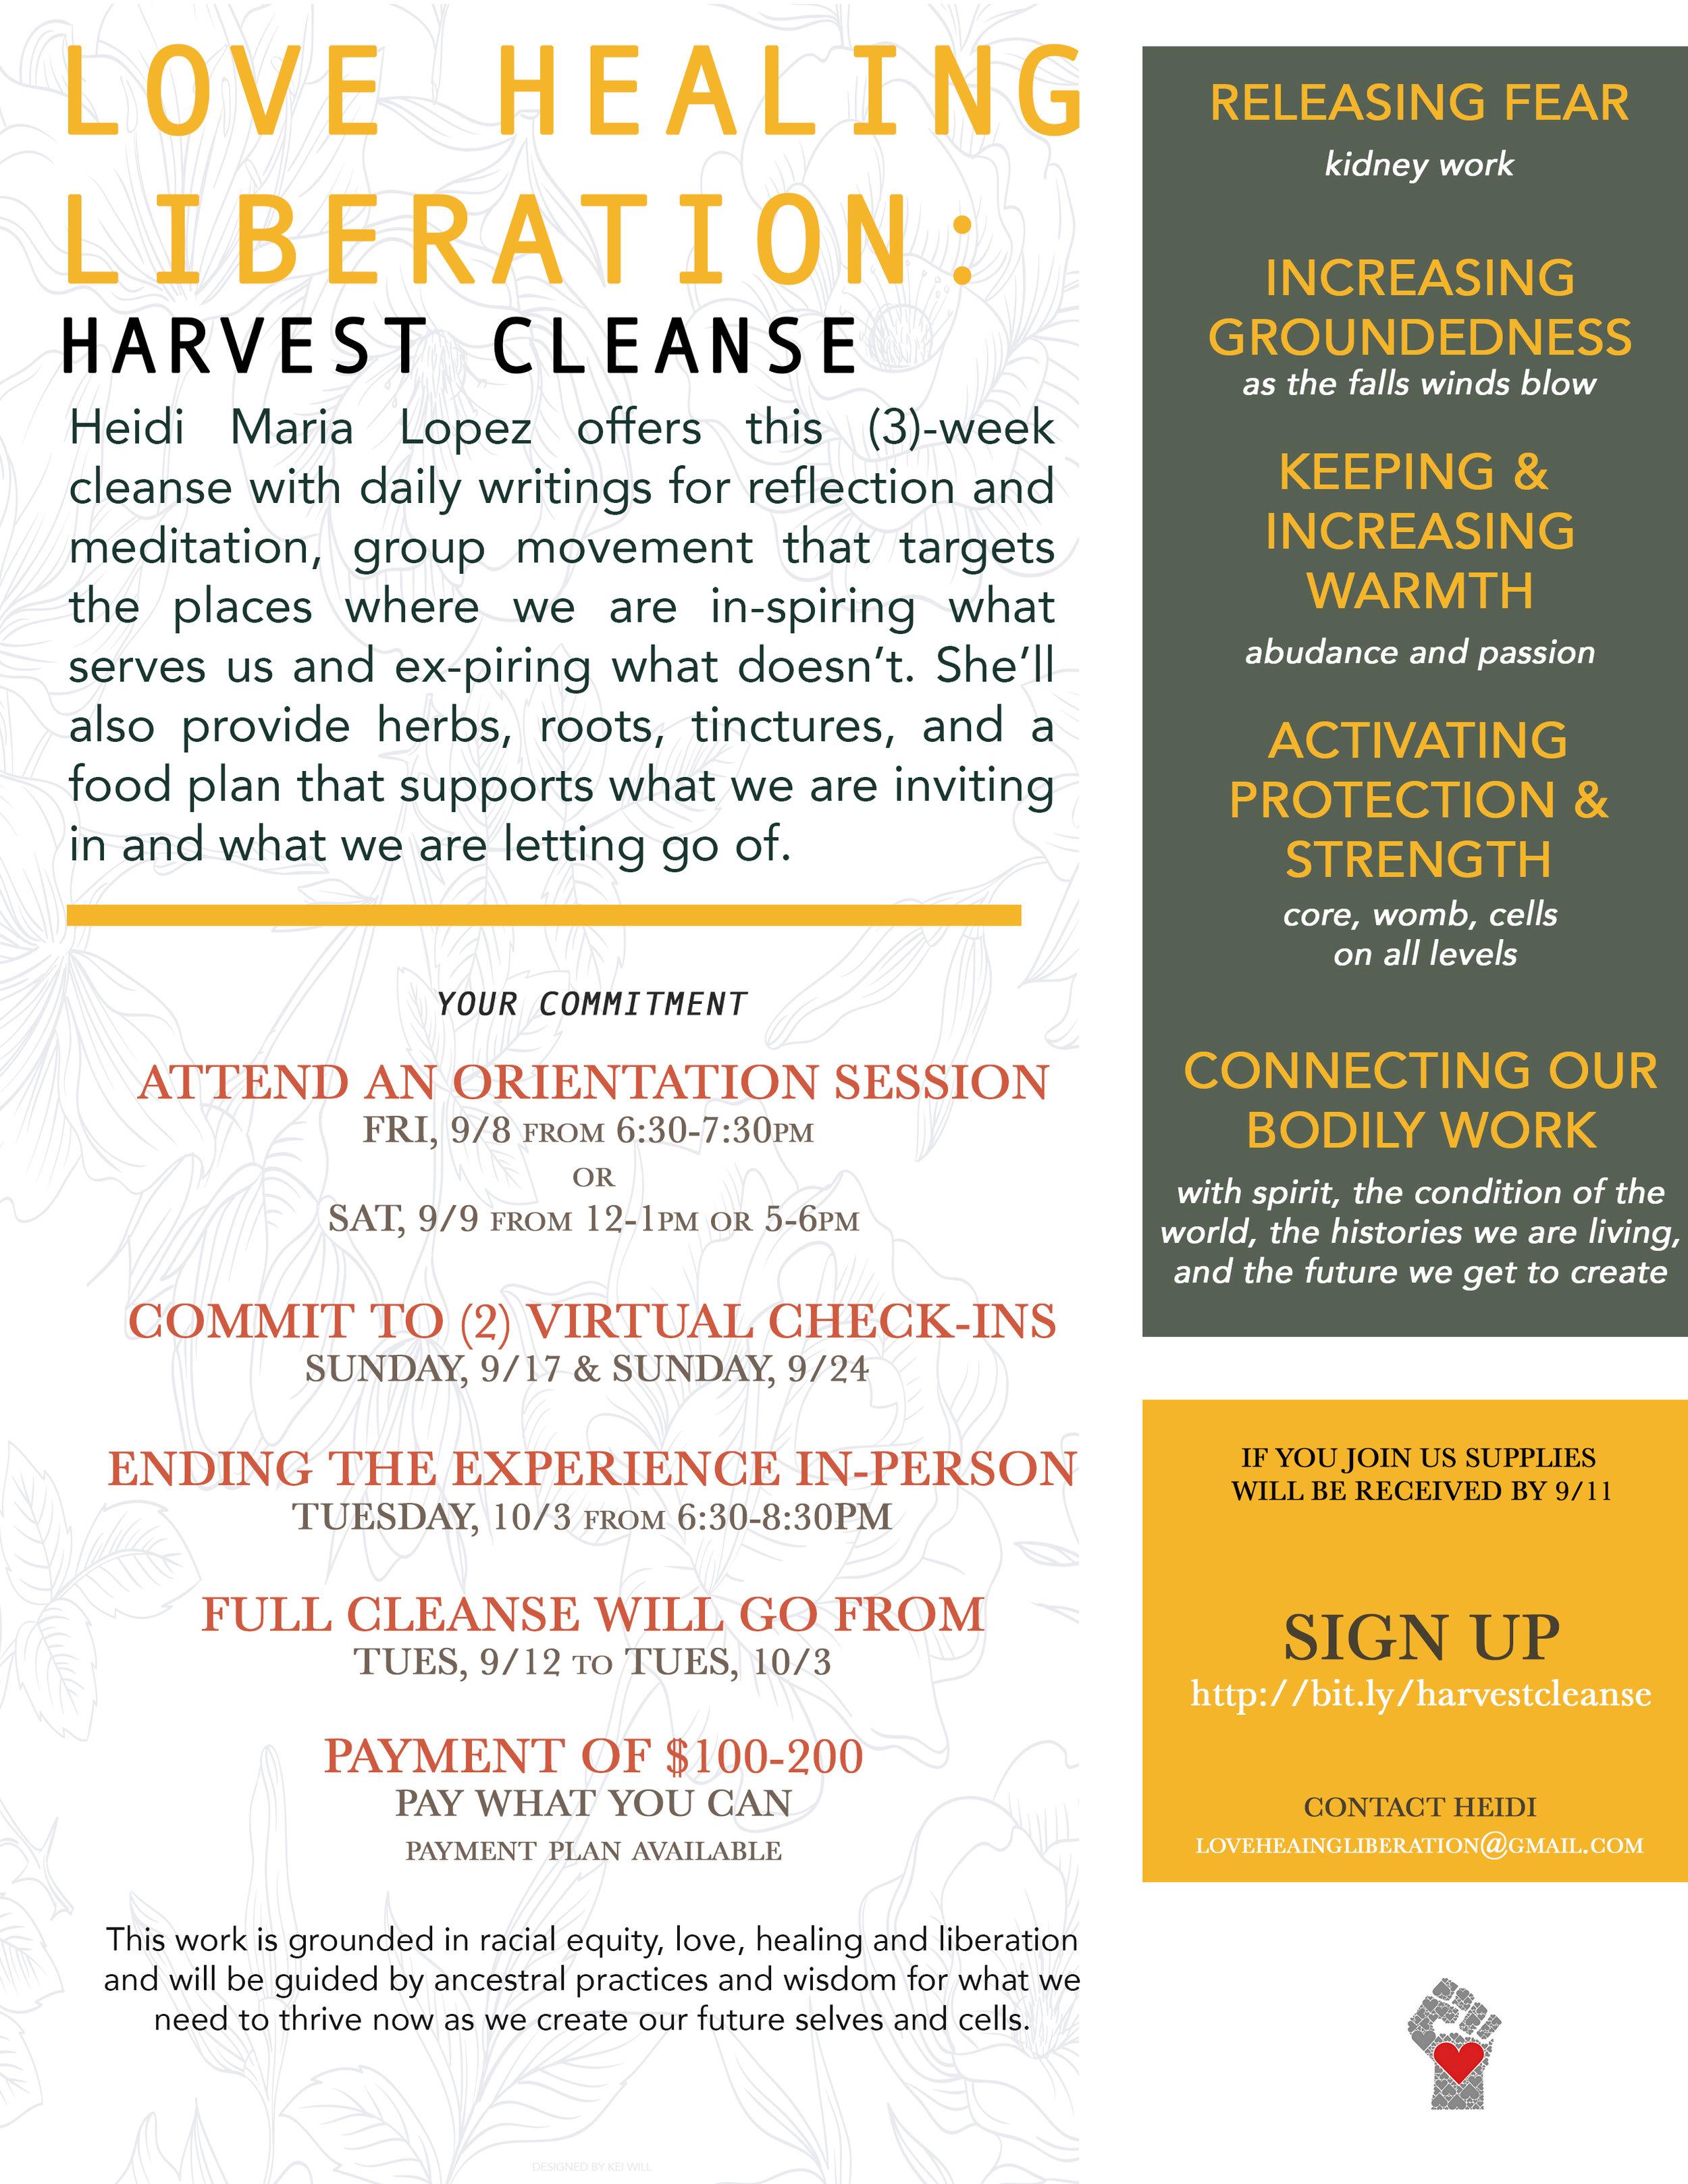 LHL-HarvestCleanse (1).jpg